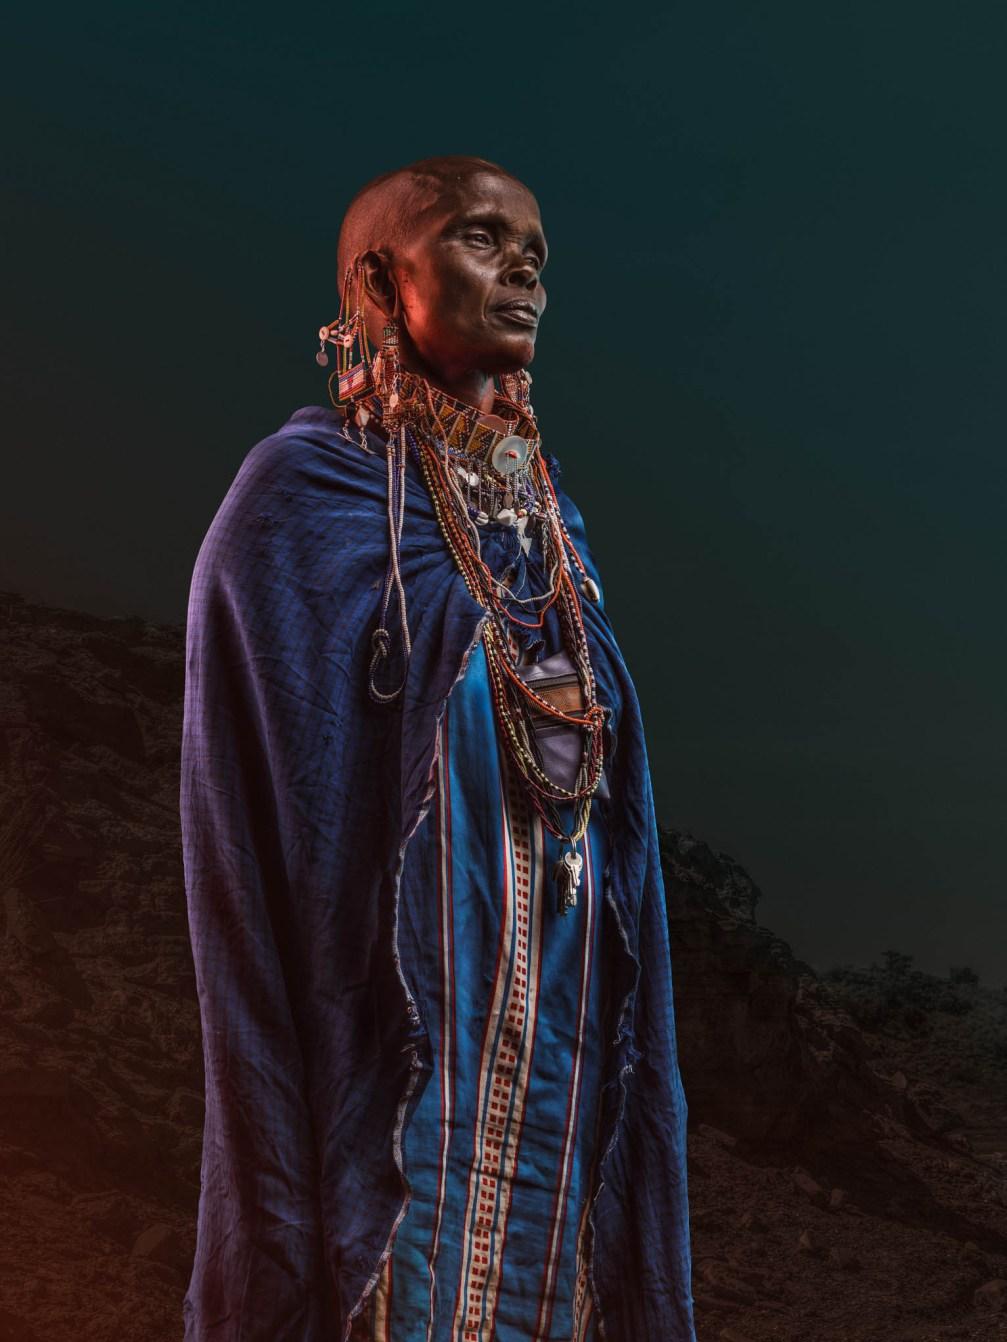 Osbourne Macharia and his haunting ability to capture light. Images courtesy of Osbourne Macharia (K63 Studios). ©OsbourneMacharia